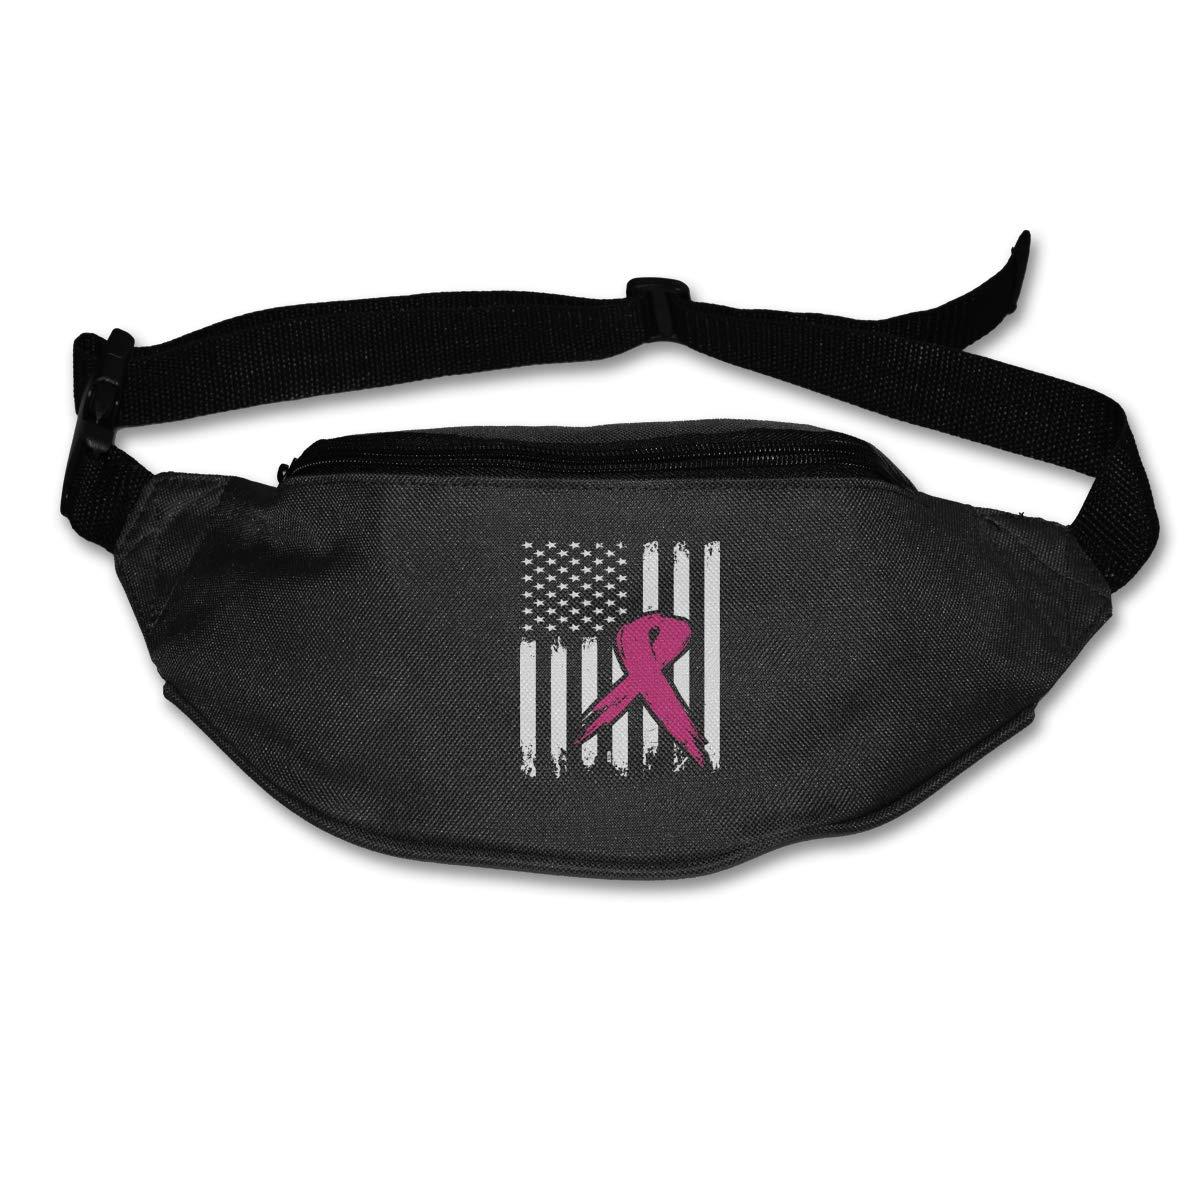 Breast Cancer Flag Sport Waist Pack Fanny Pack Adjustable For Hike